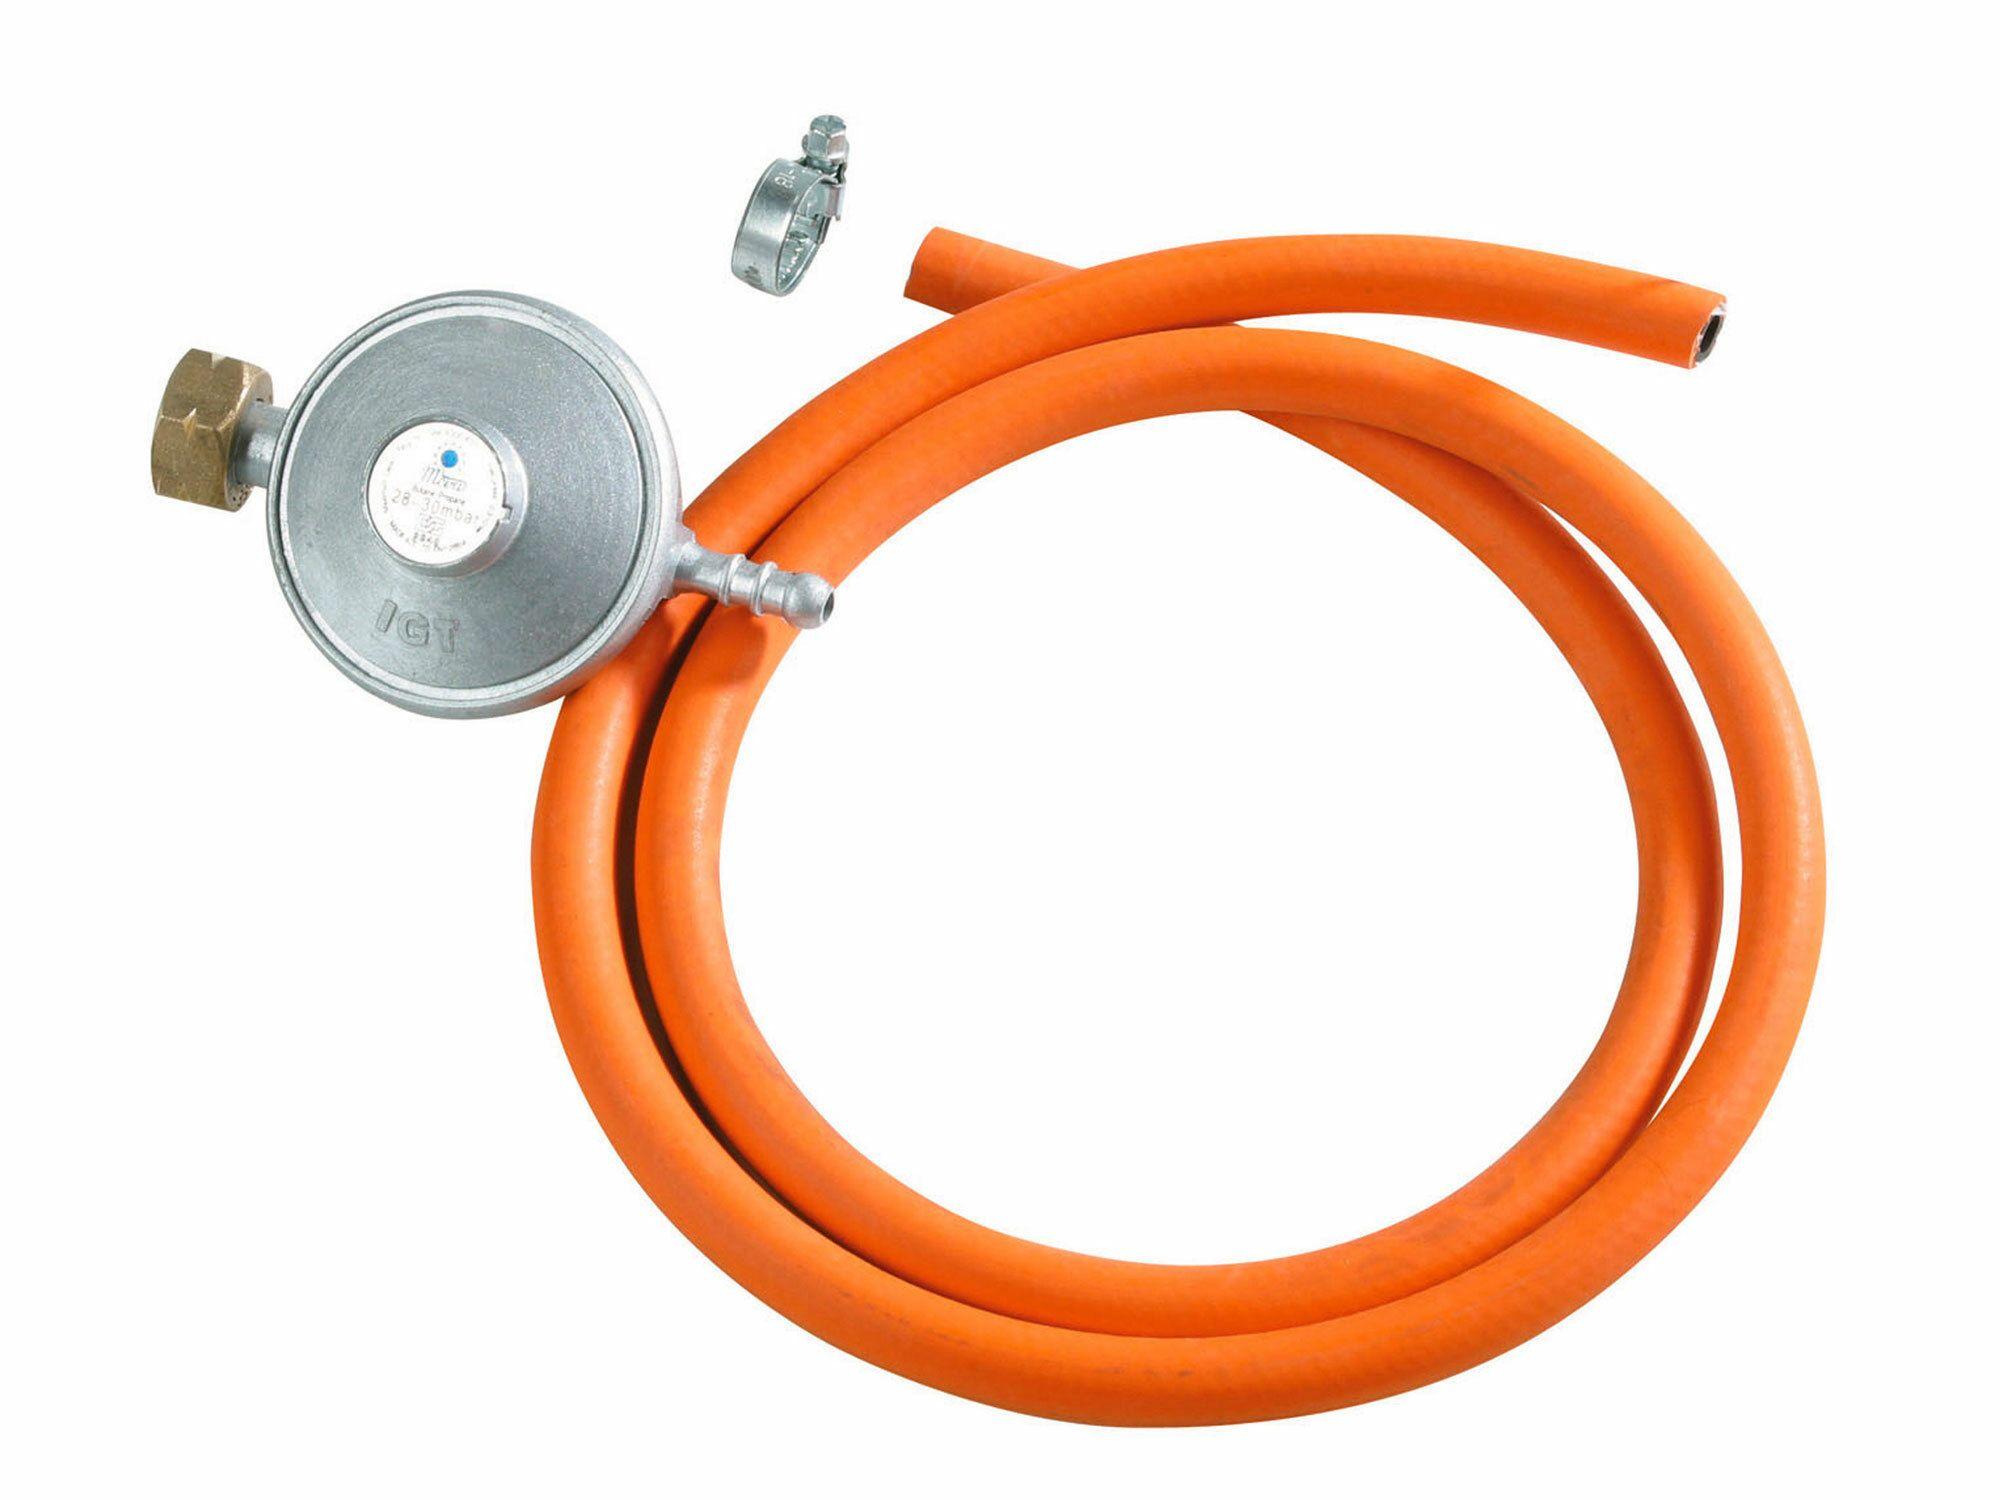 Regulátor tlaku 30mbar s hadicí, regulátor tlaku 30mbar (3kPa), hadice na LPG 1,5m, HERON